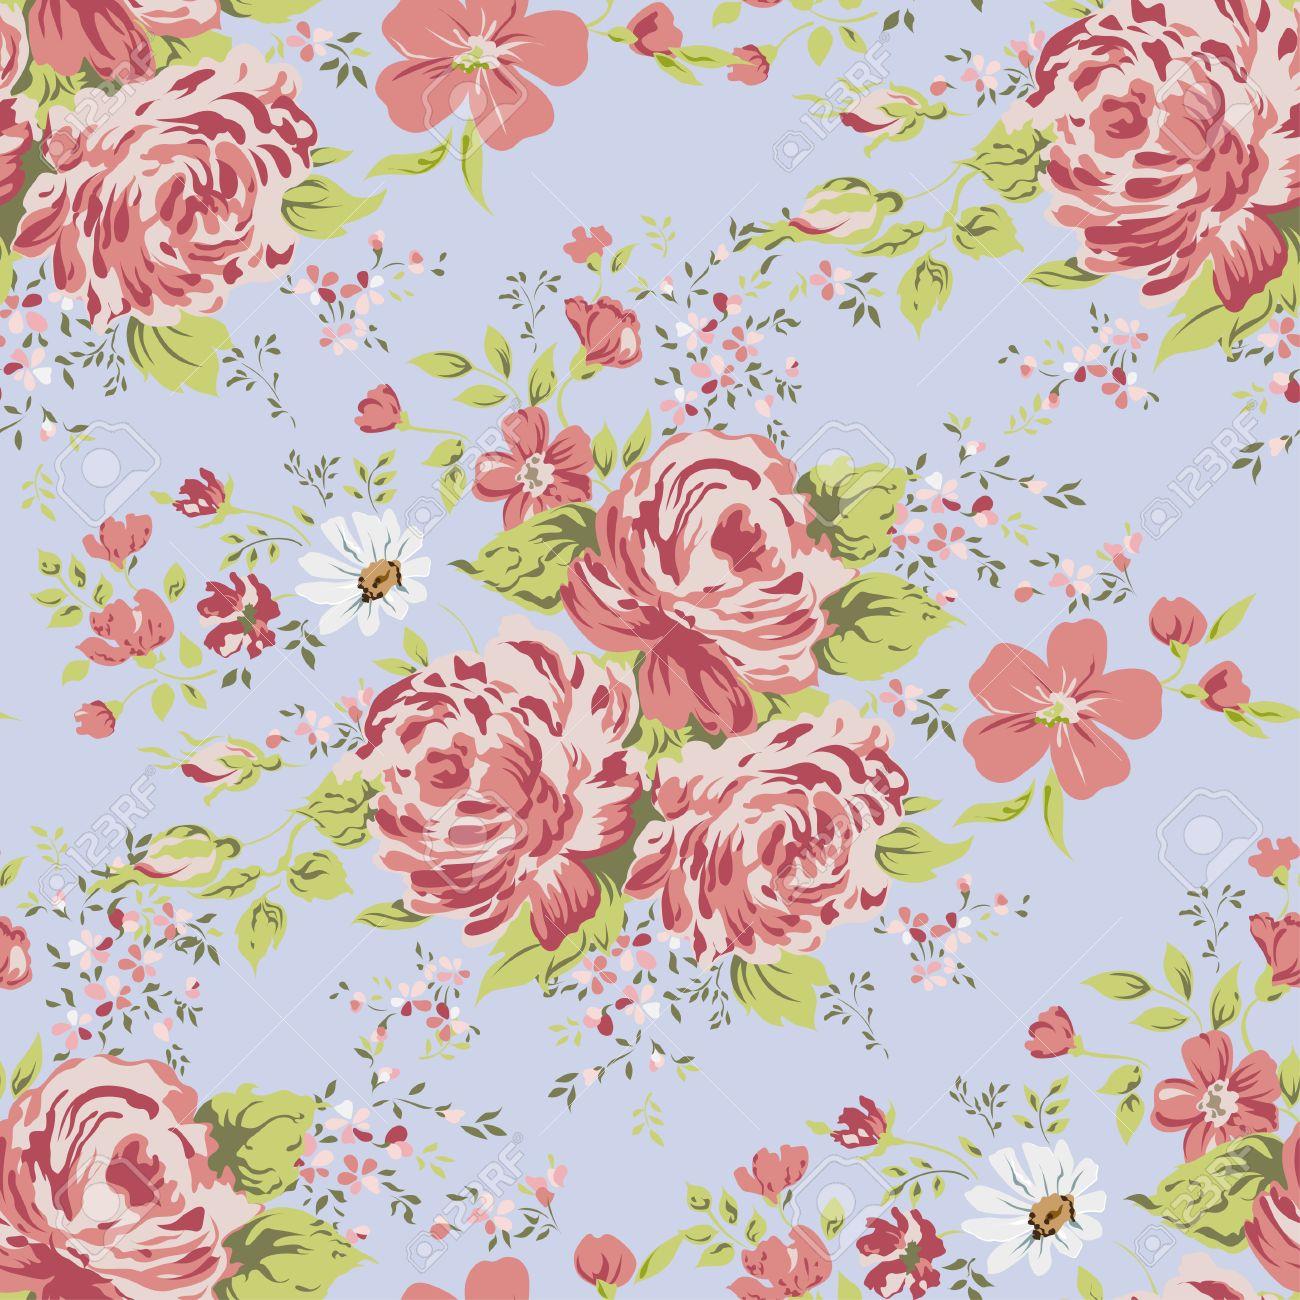 Wallpaper Seamless Vintage Pink Flower Pattern Royalty Free